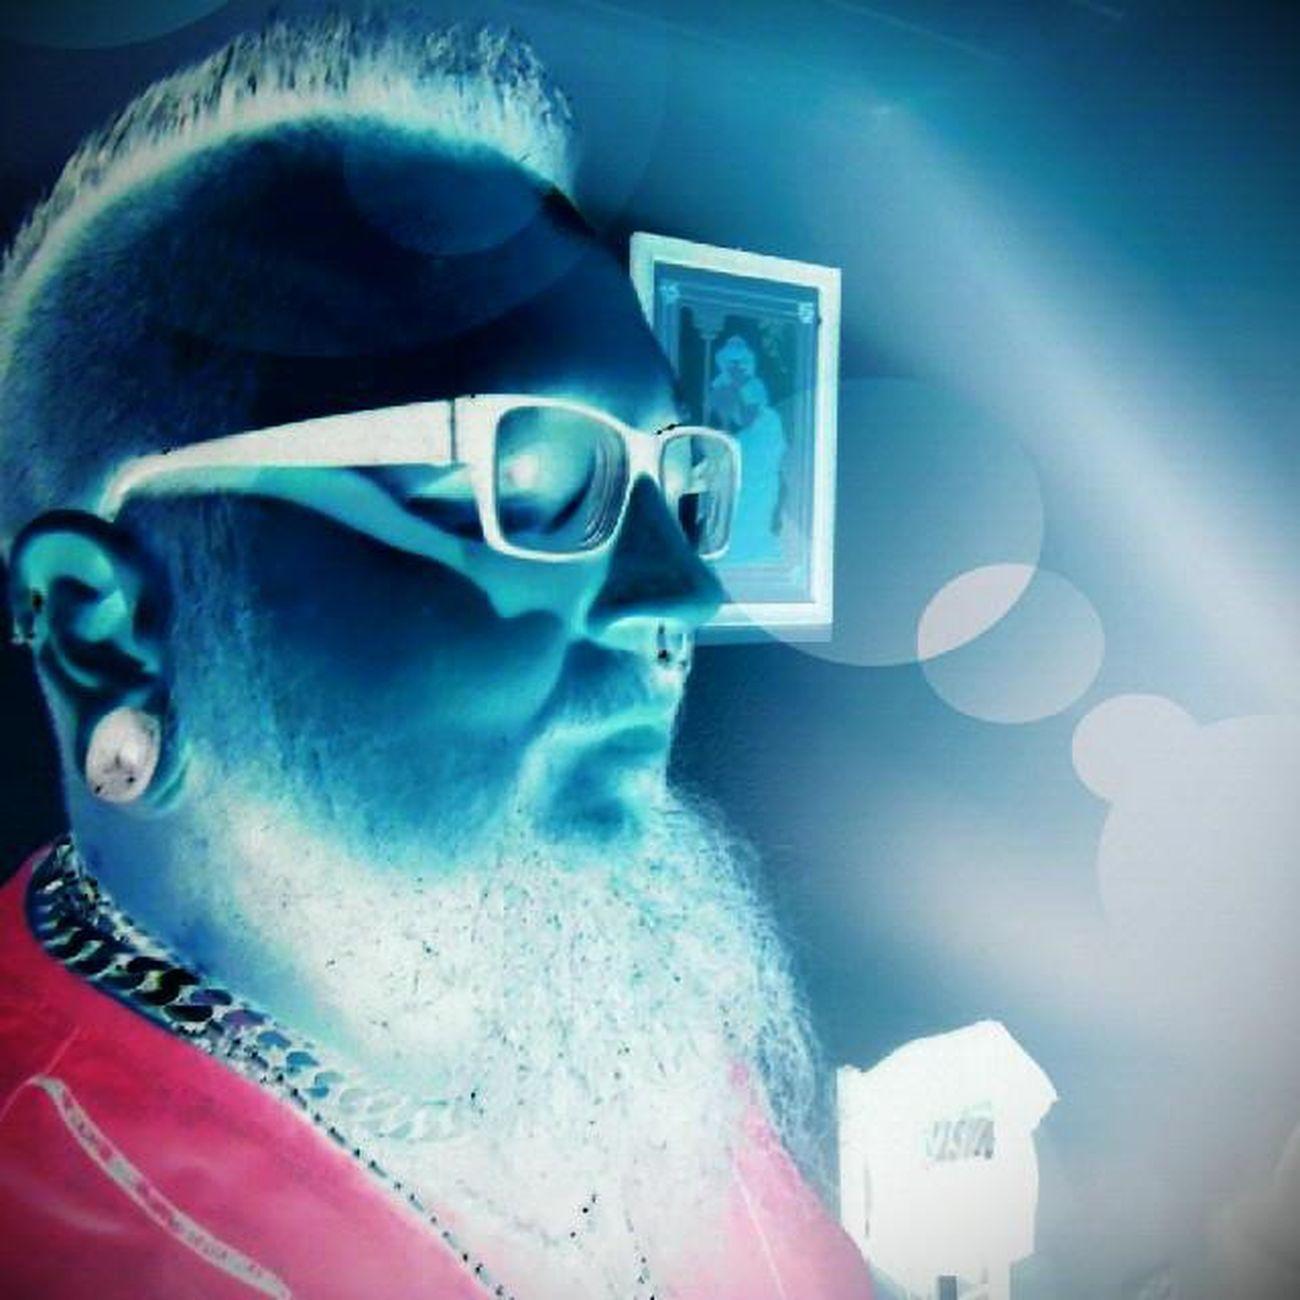 Selfie Tuesday Invert Lomo Blackberry Blackberryq10 Stone Plug Tunnel Septum Helix Piercing White Beard Bearded Nerd Glasses Iro Chains Noshavelife Ilovemybeard Manwithbeard Instapic Photostudio Pro for blackberry10